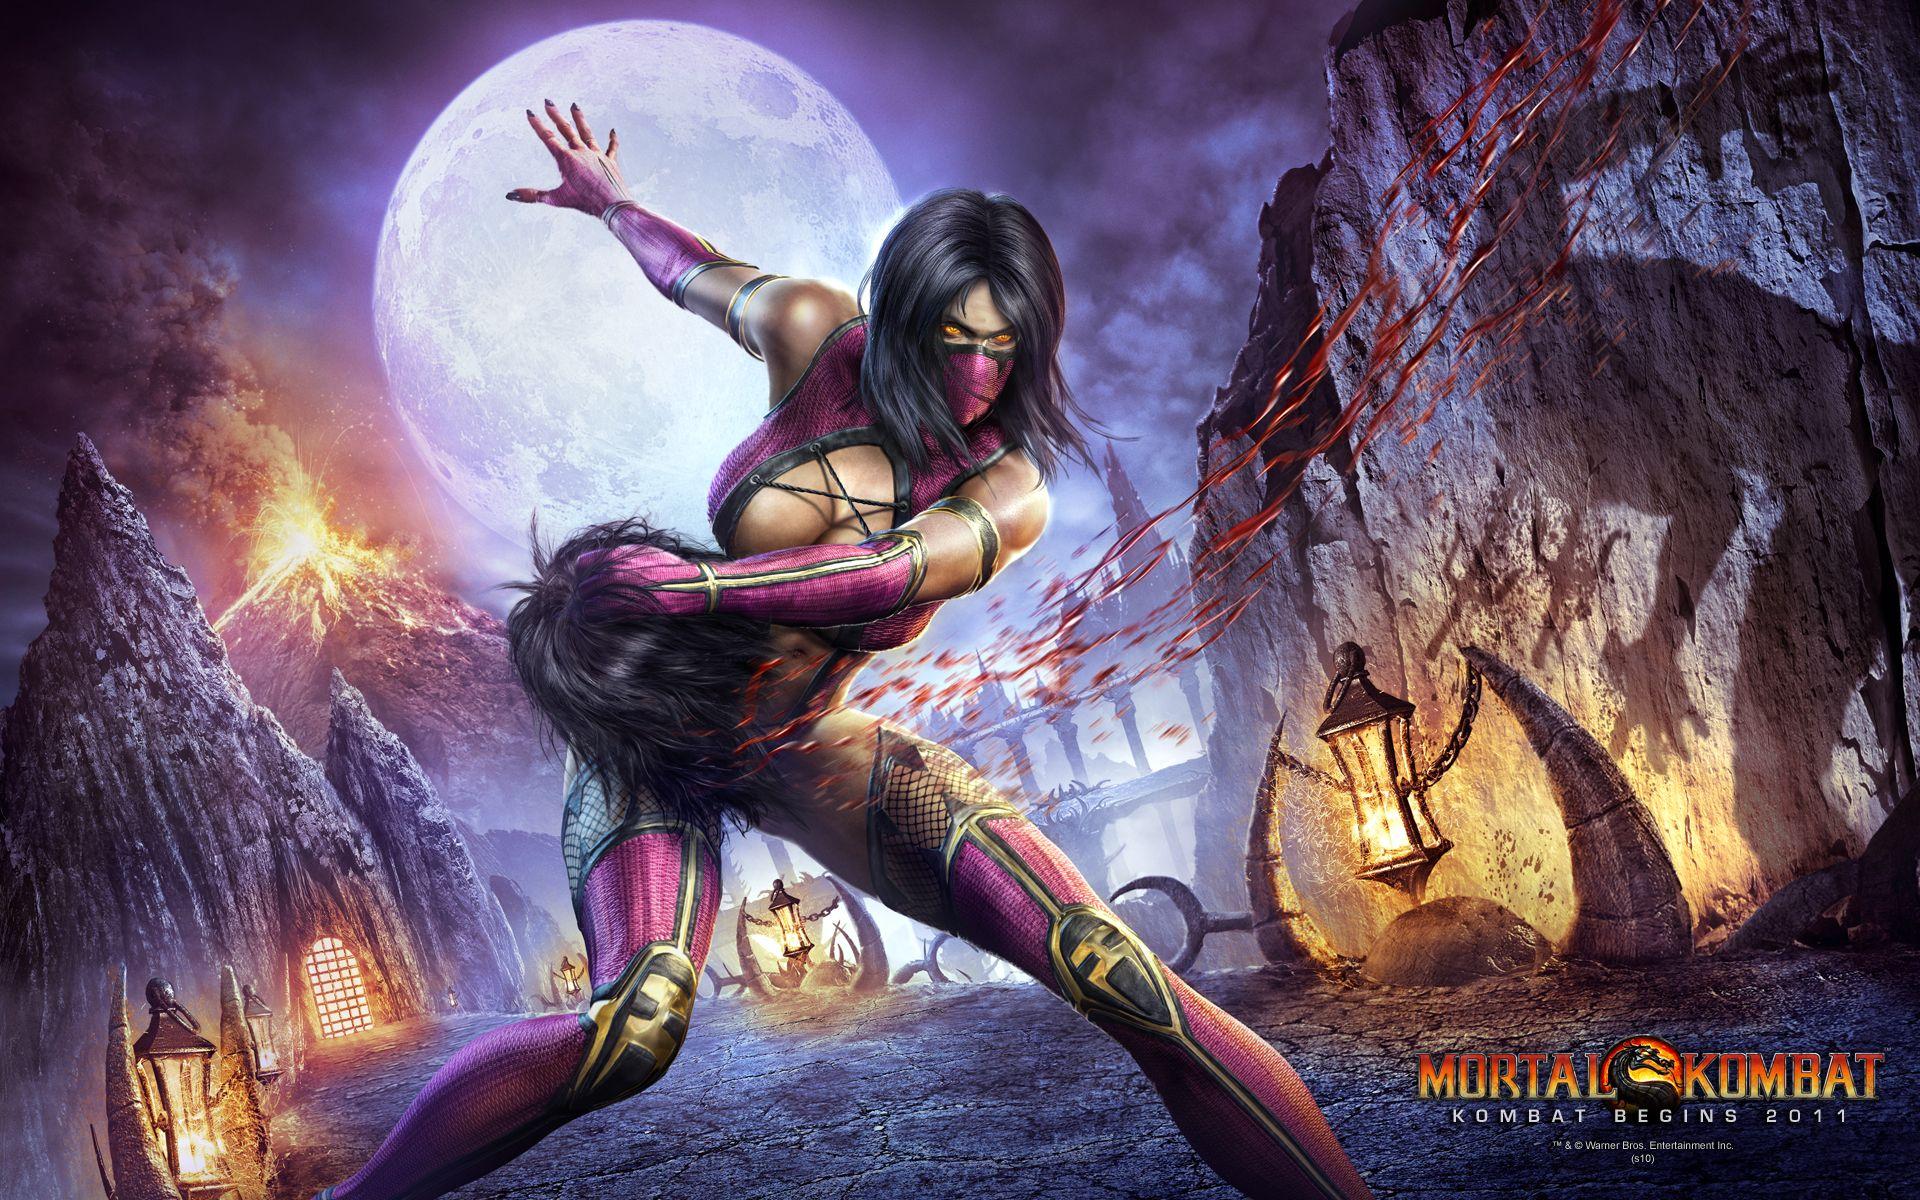 28+] Mortal Kombat Wallpaper Mileena on